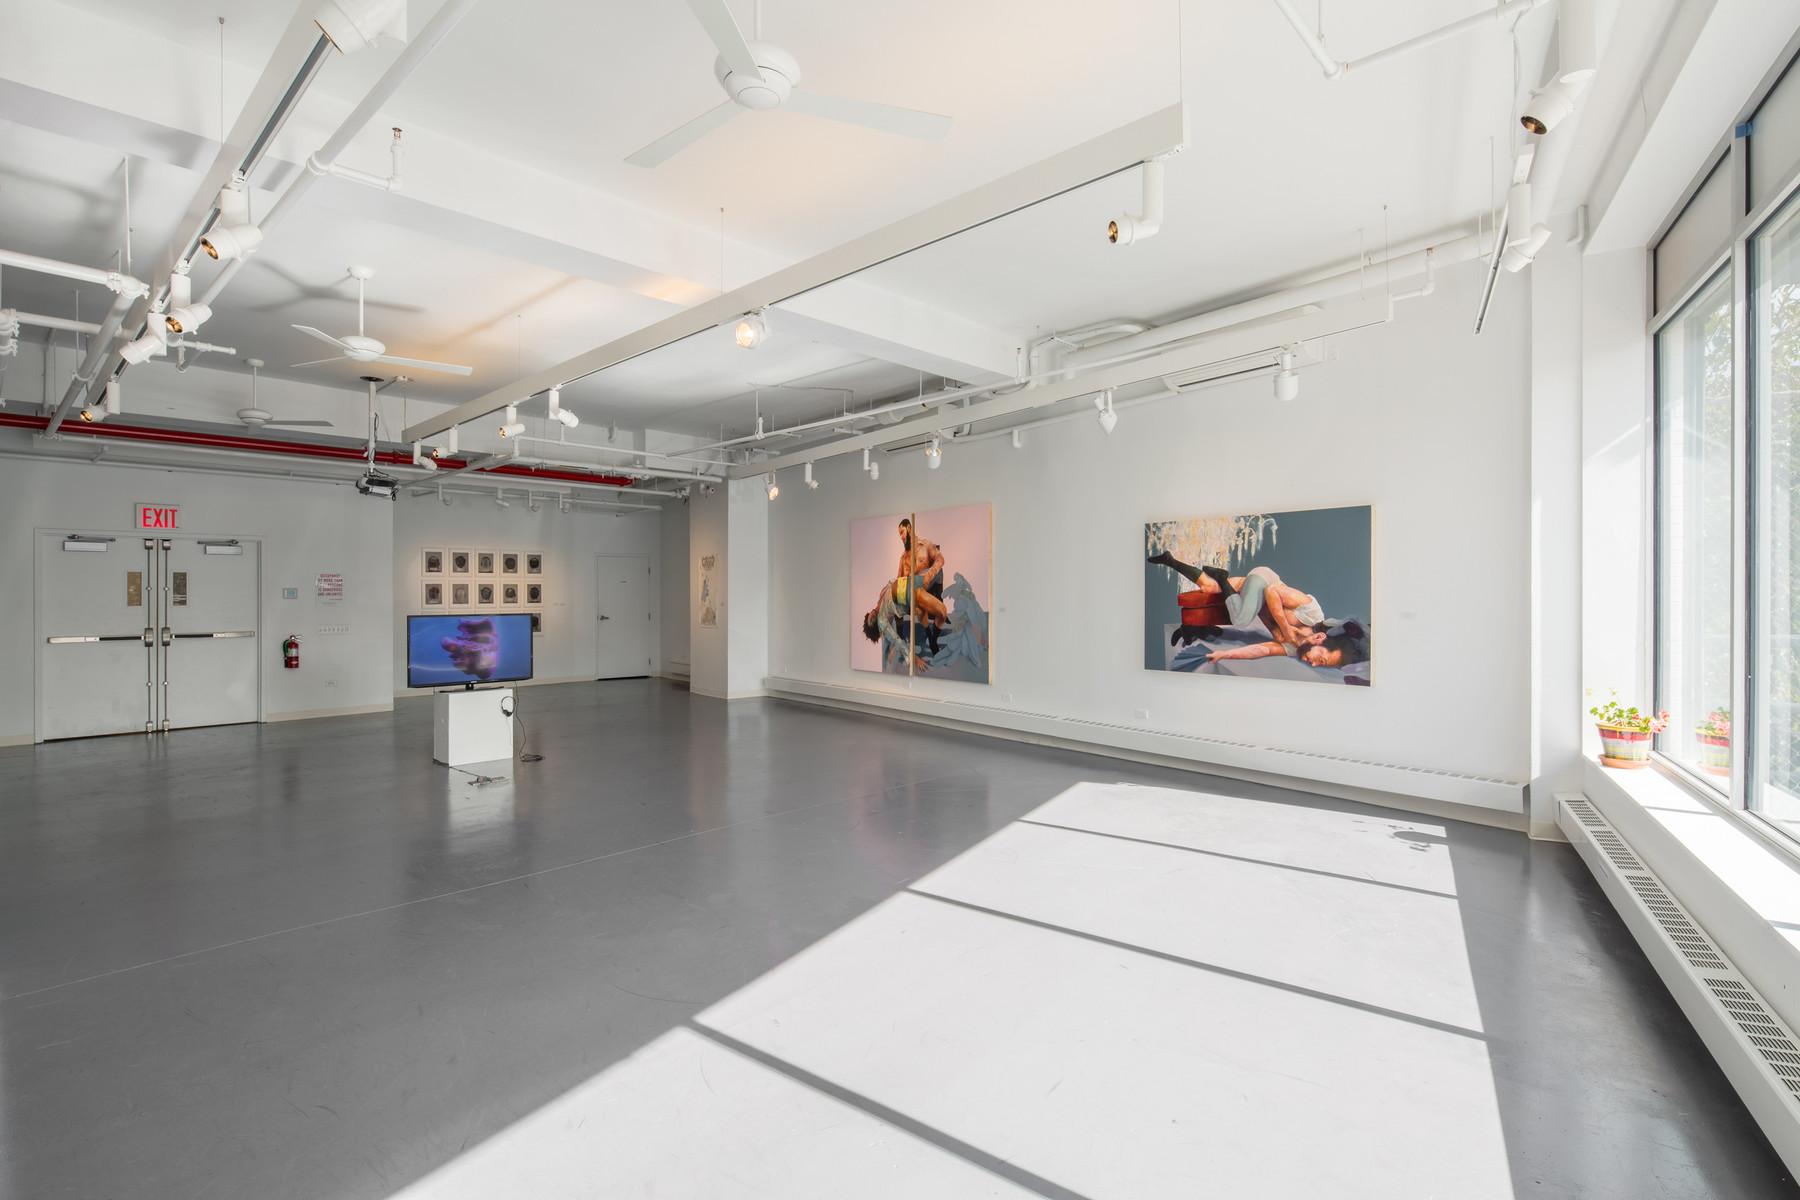 Bronx River Arts Center